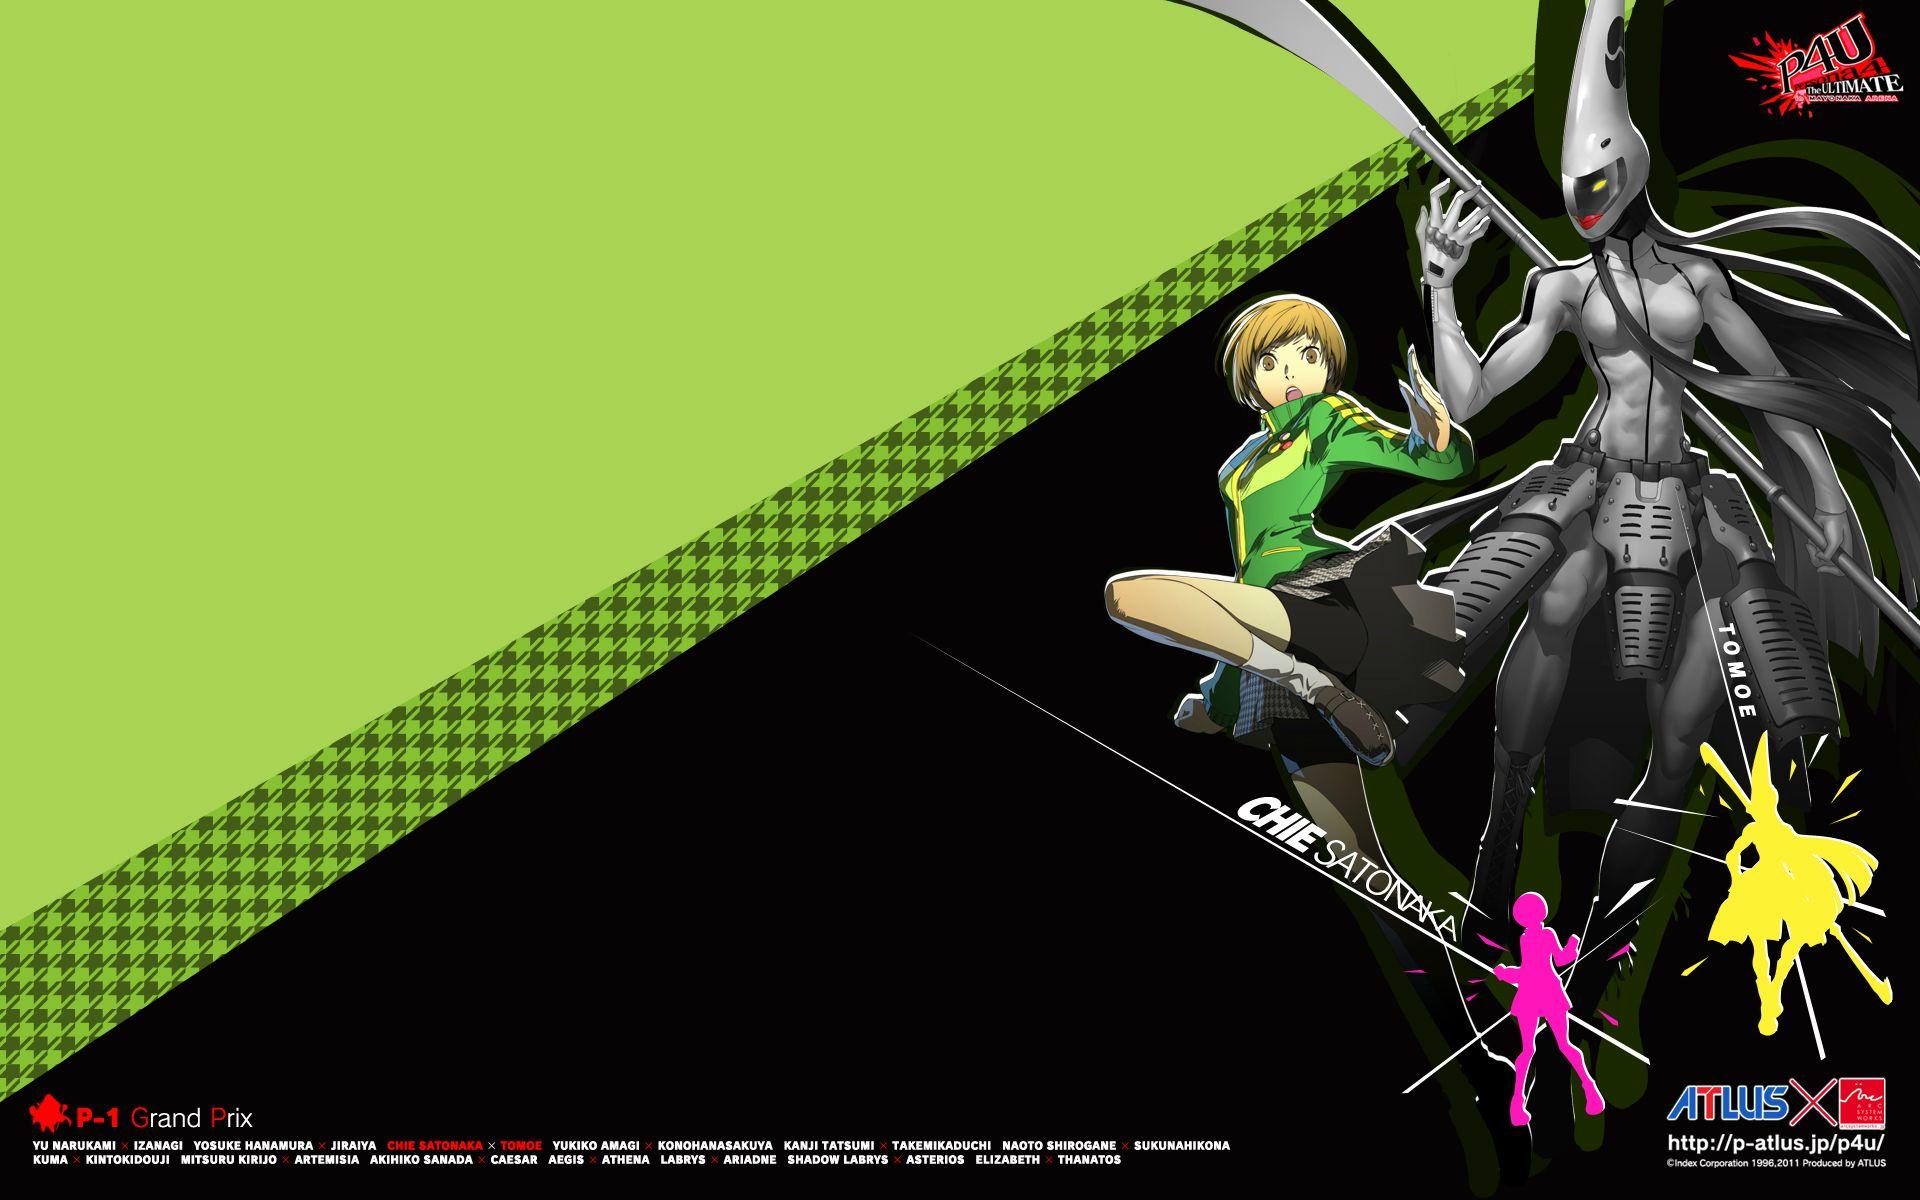 Persona Arena Wallpaper View Fullsize Persona 4 The